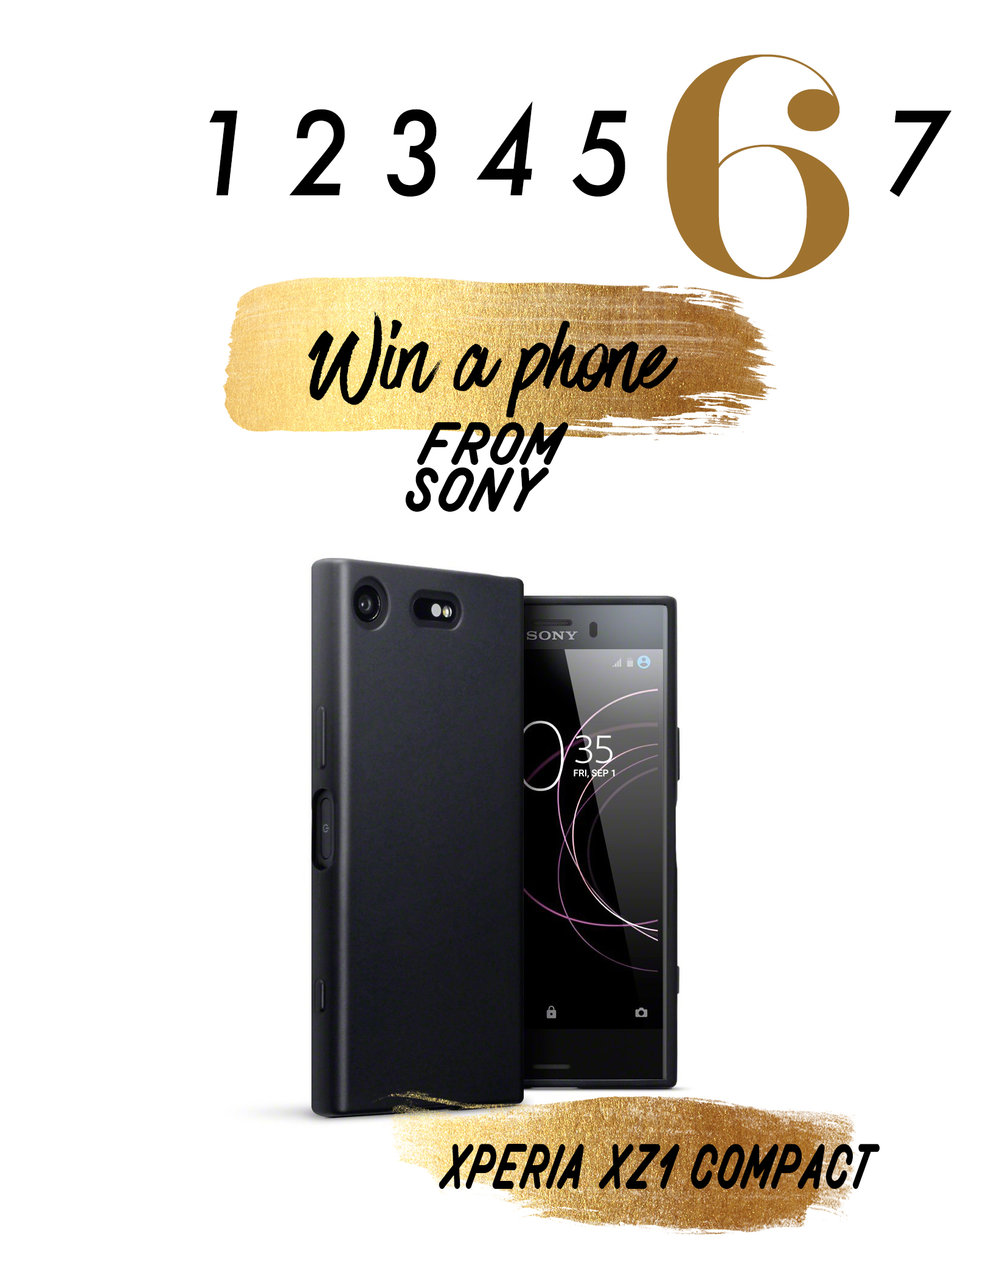 Türchen 6- Das Sony Xperia XZ1 Compact